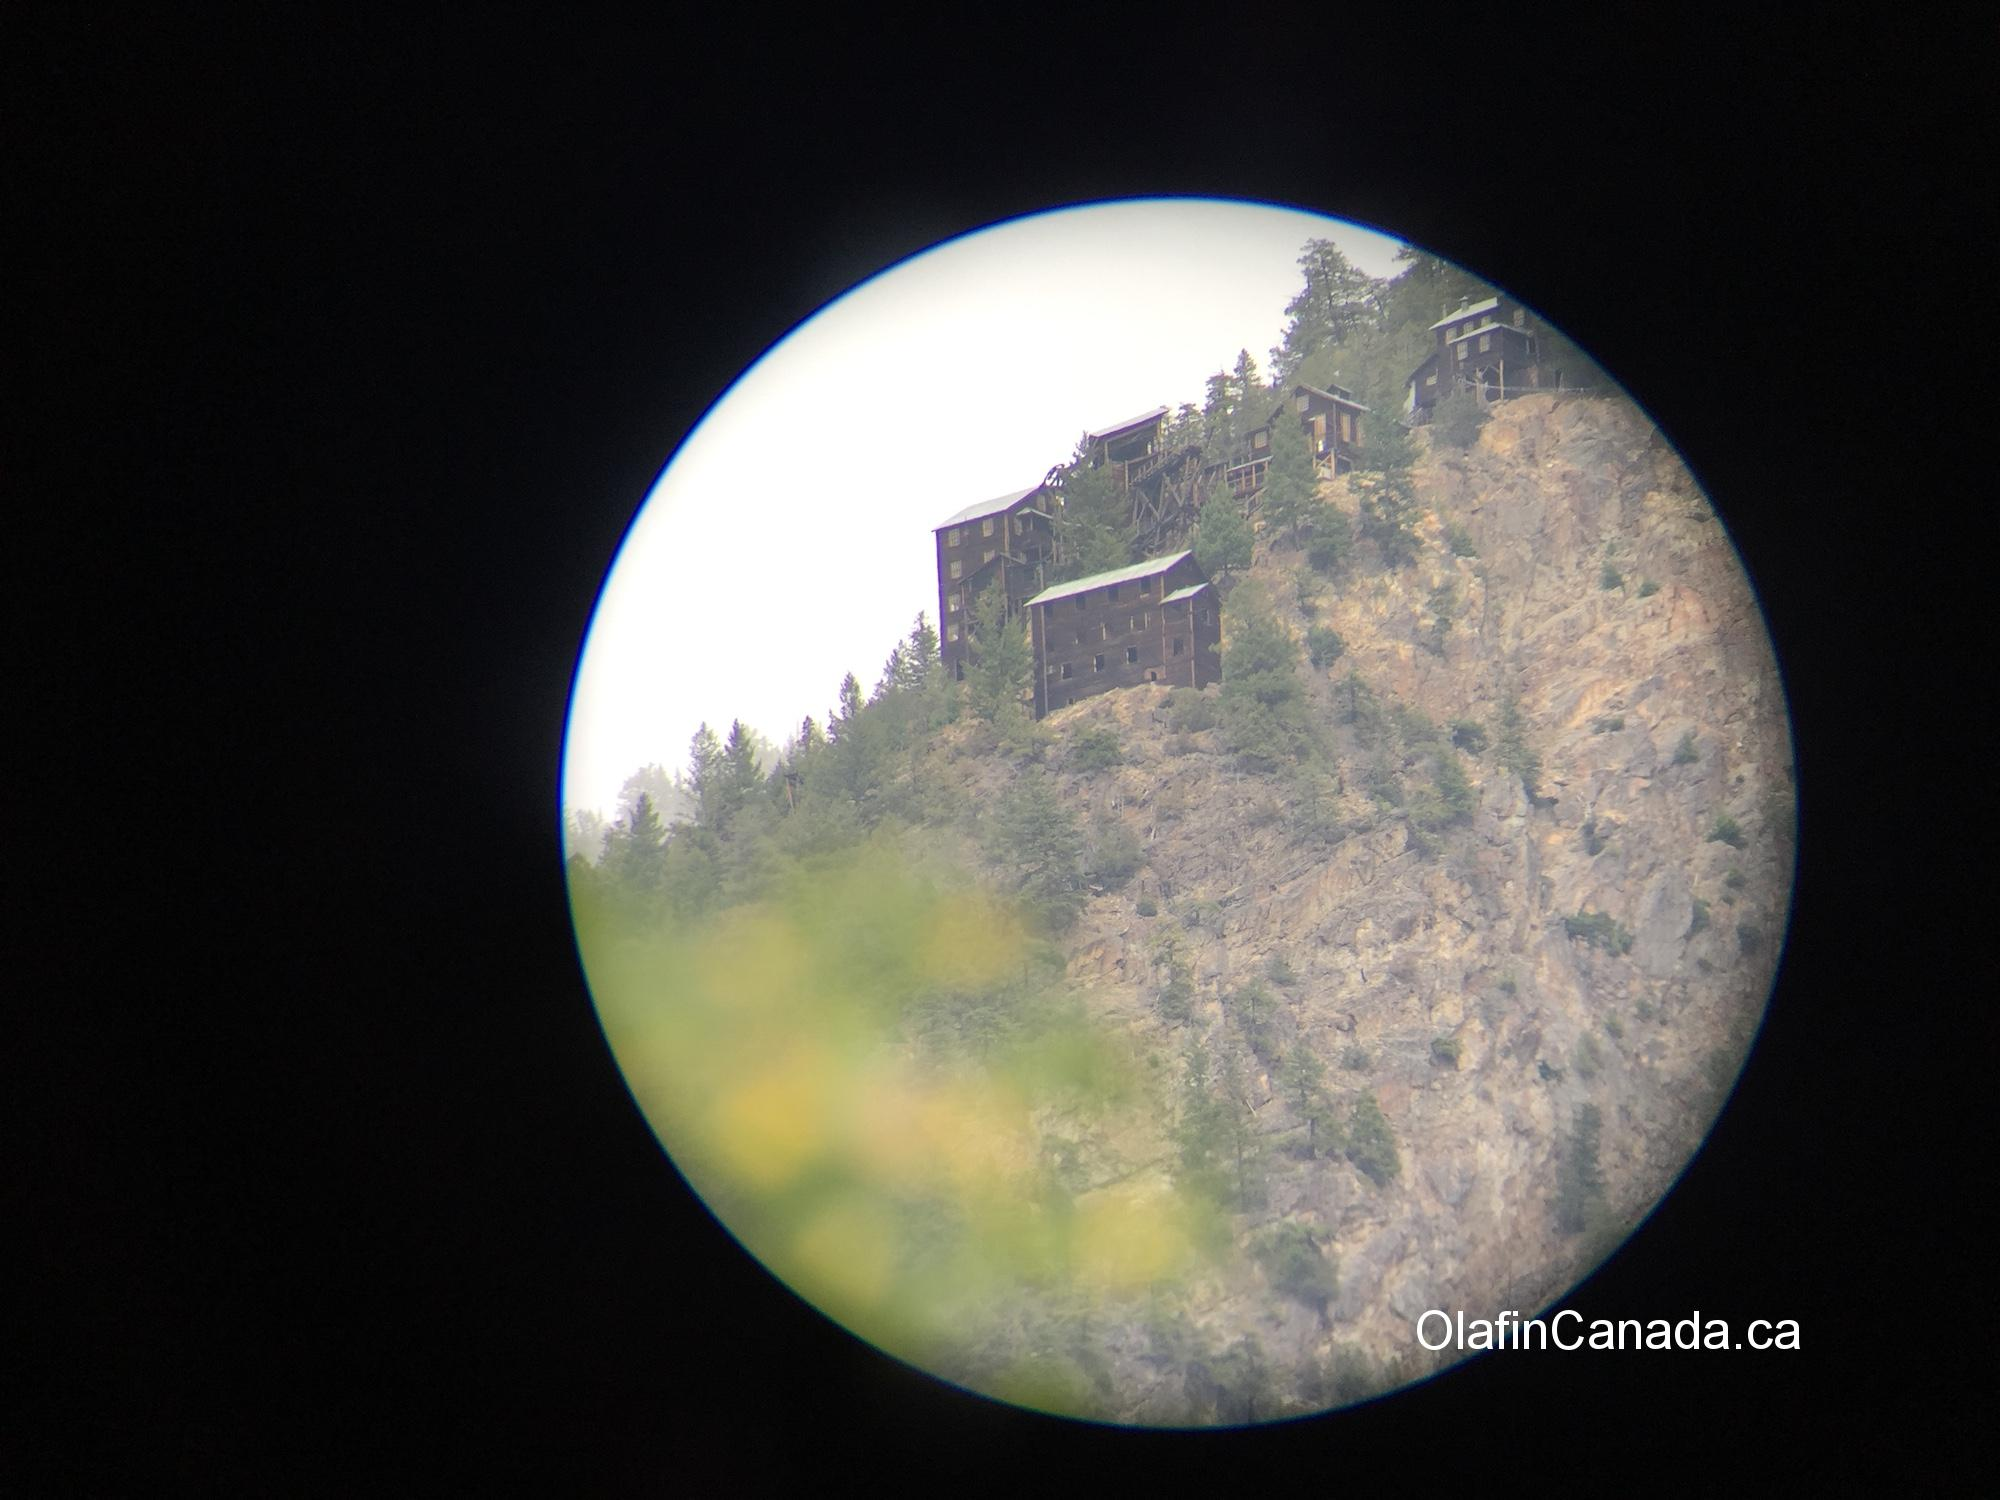 Abandoned Mascot mine on the hill behind Hedley, seen through binoculars #olafincanada #britishcolumbia #discoverbc #abandonedbc #hedley #mascotmine